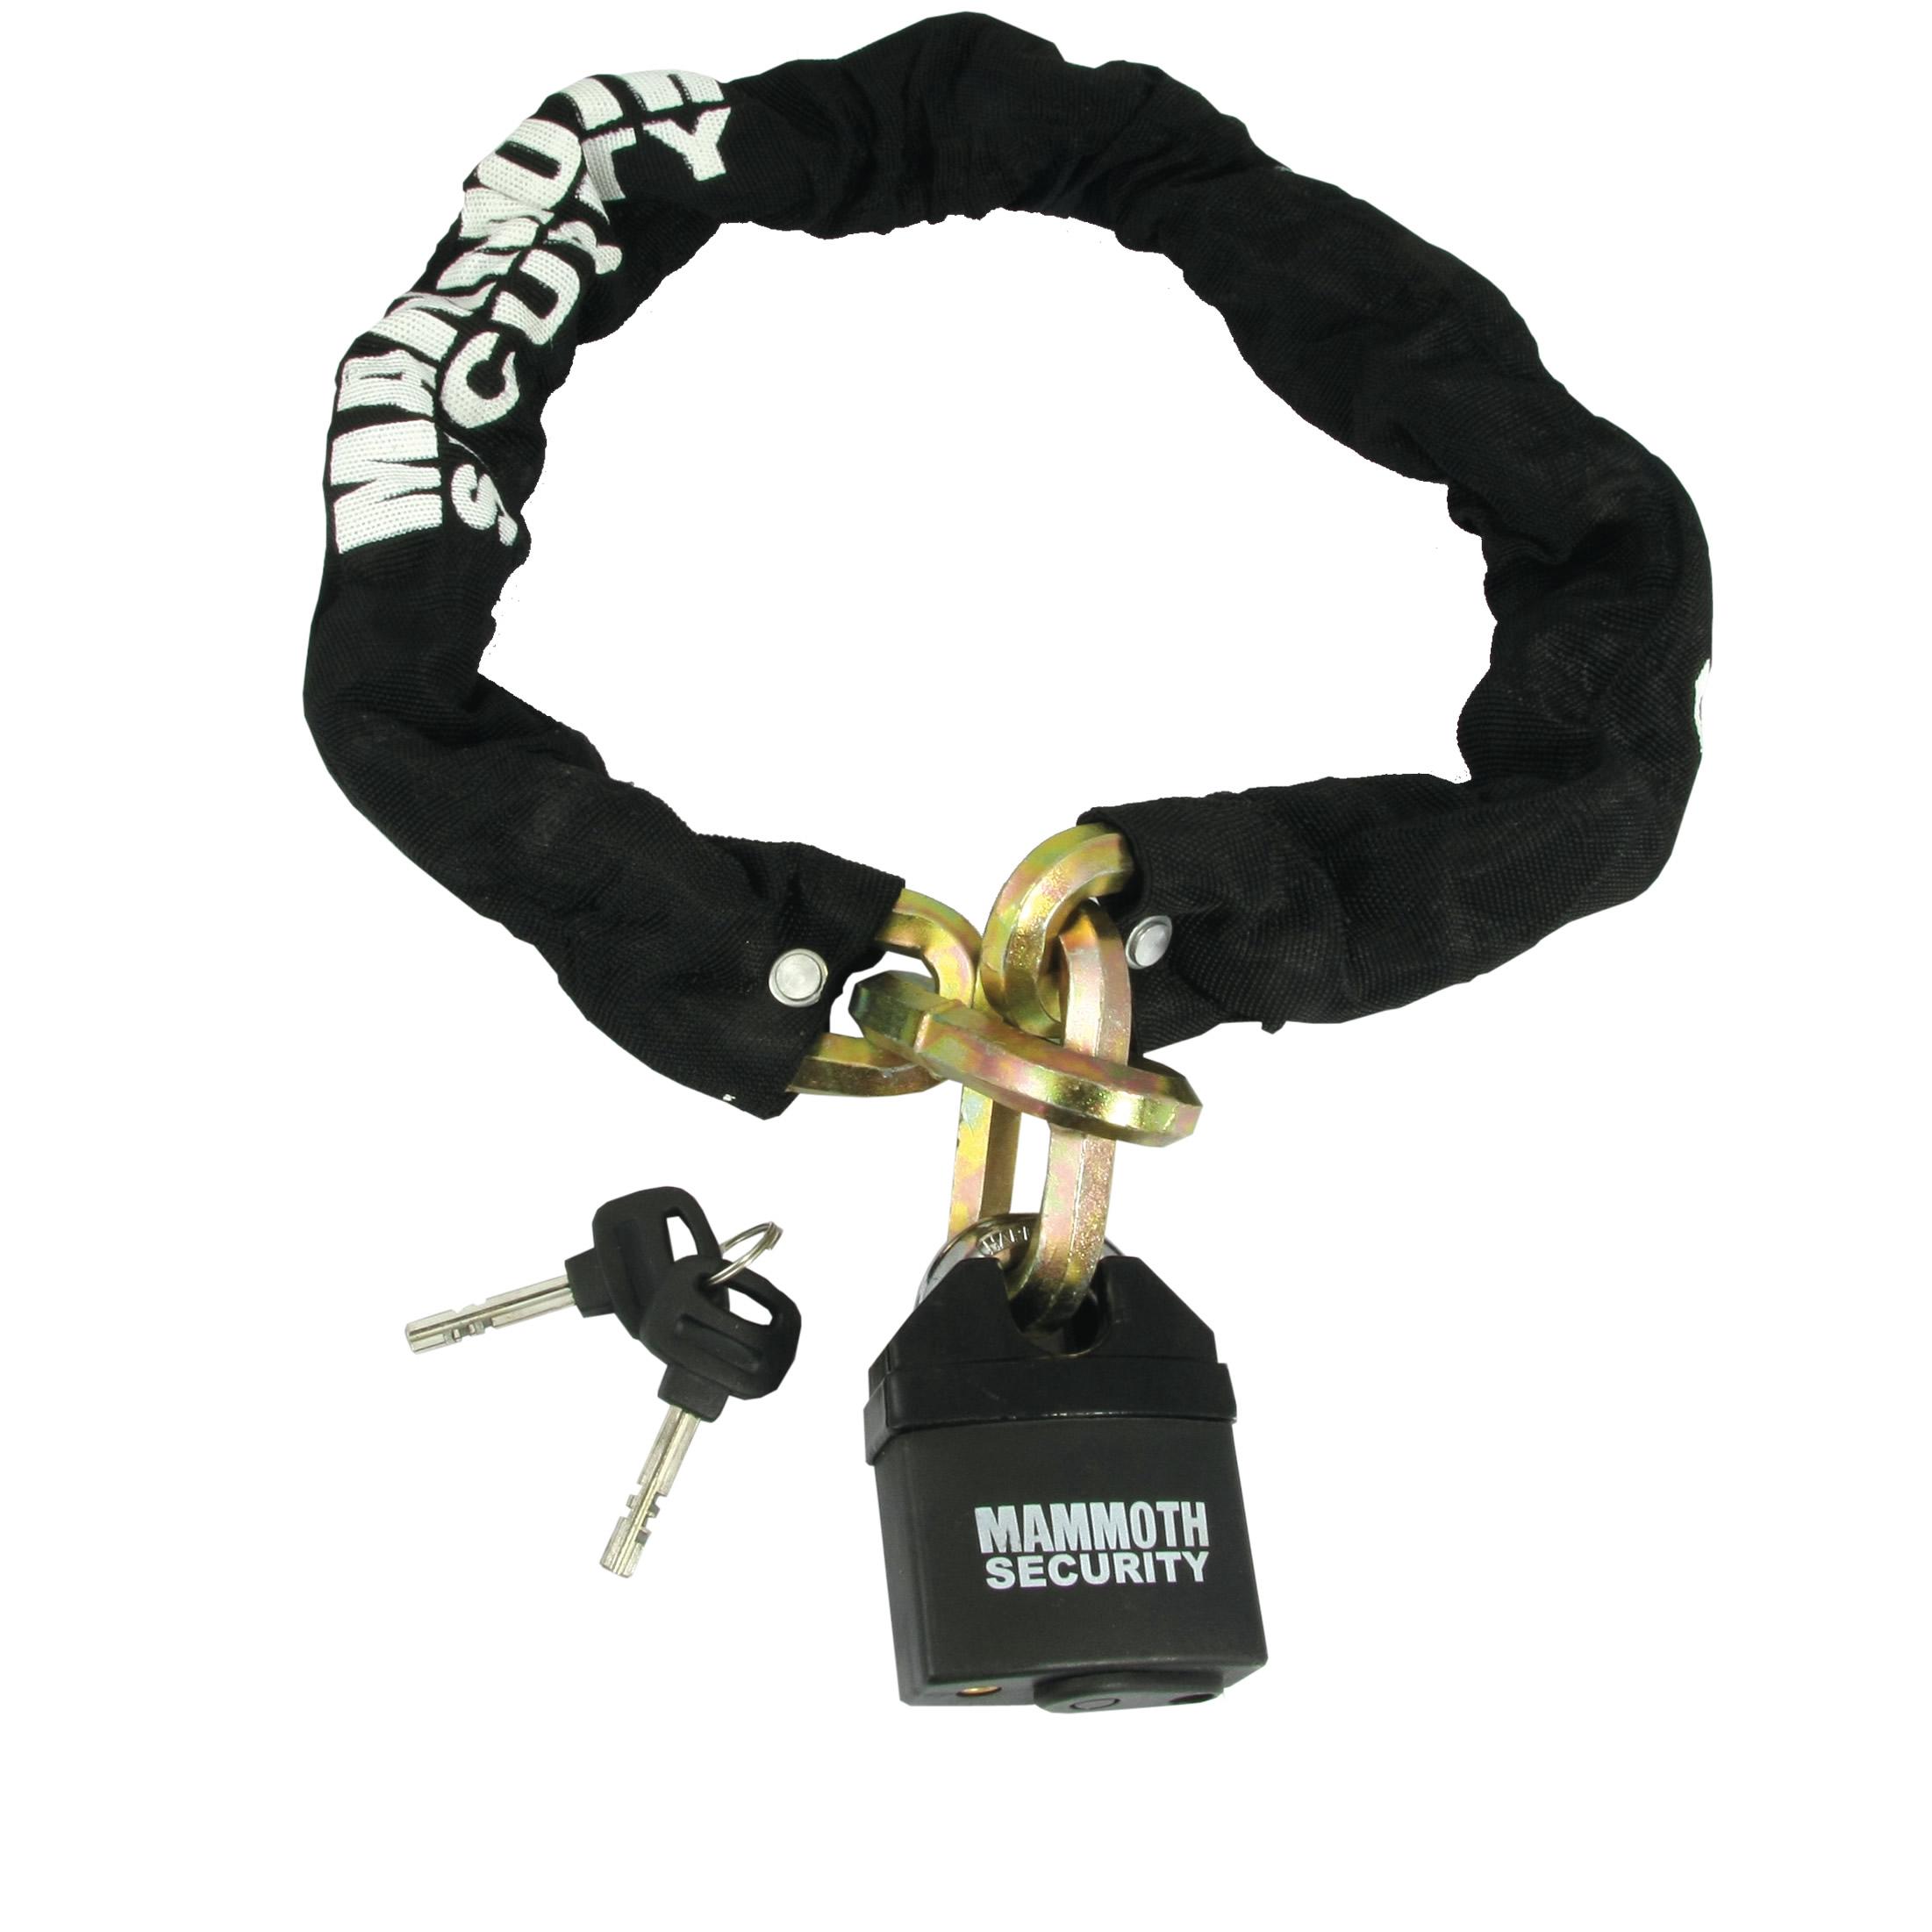 Bike It Mammoth Hexagon Chain and Lock 1m - Chains, Cables & U-Locks ...